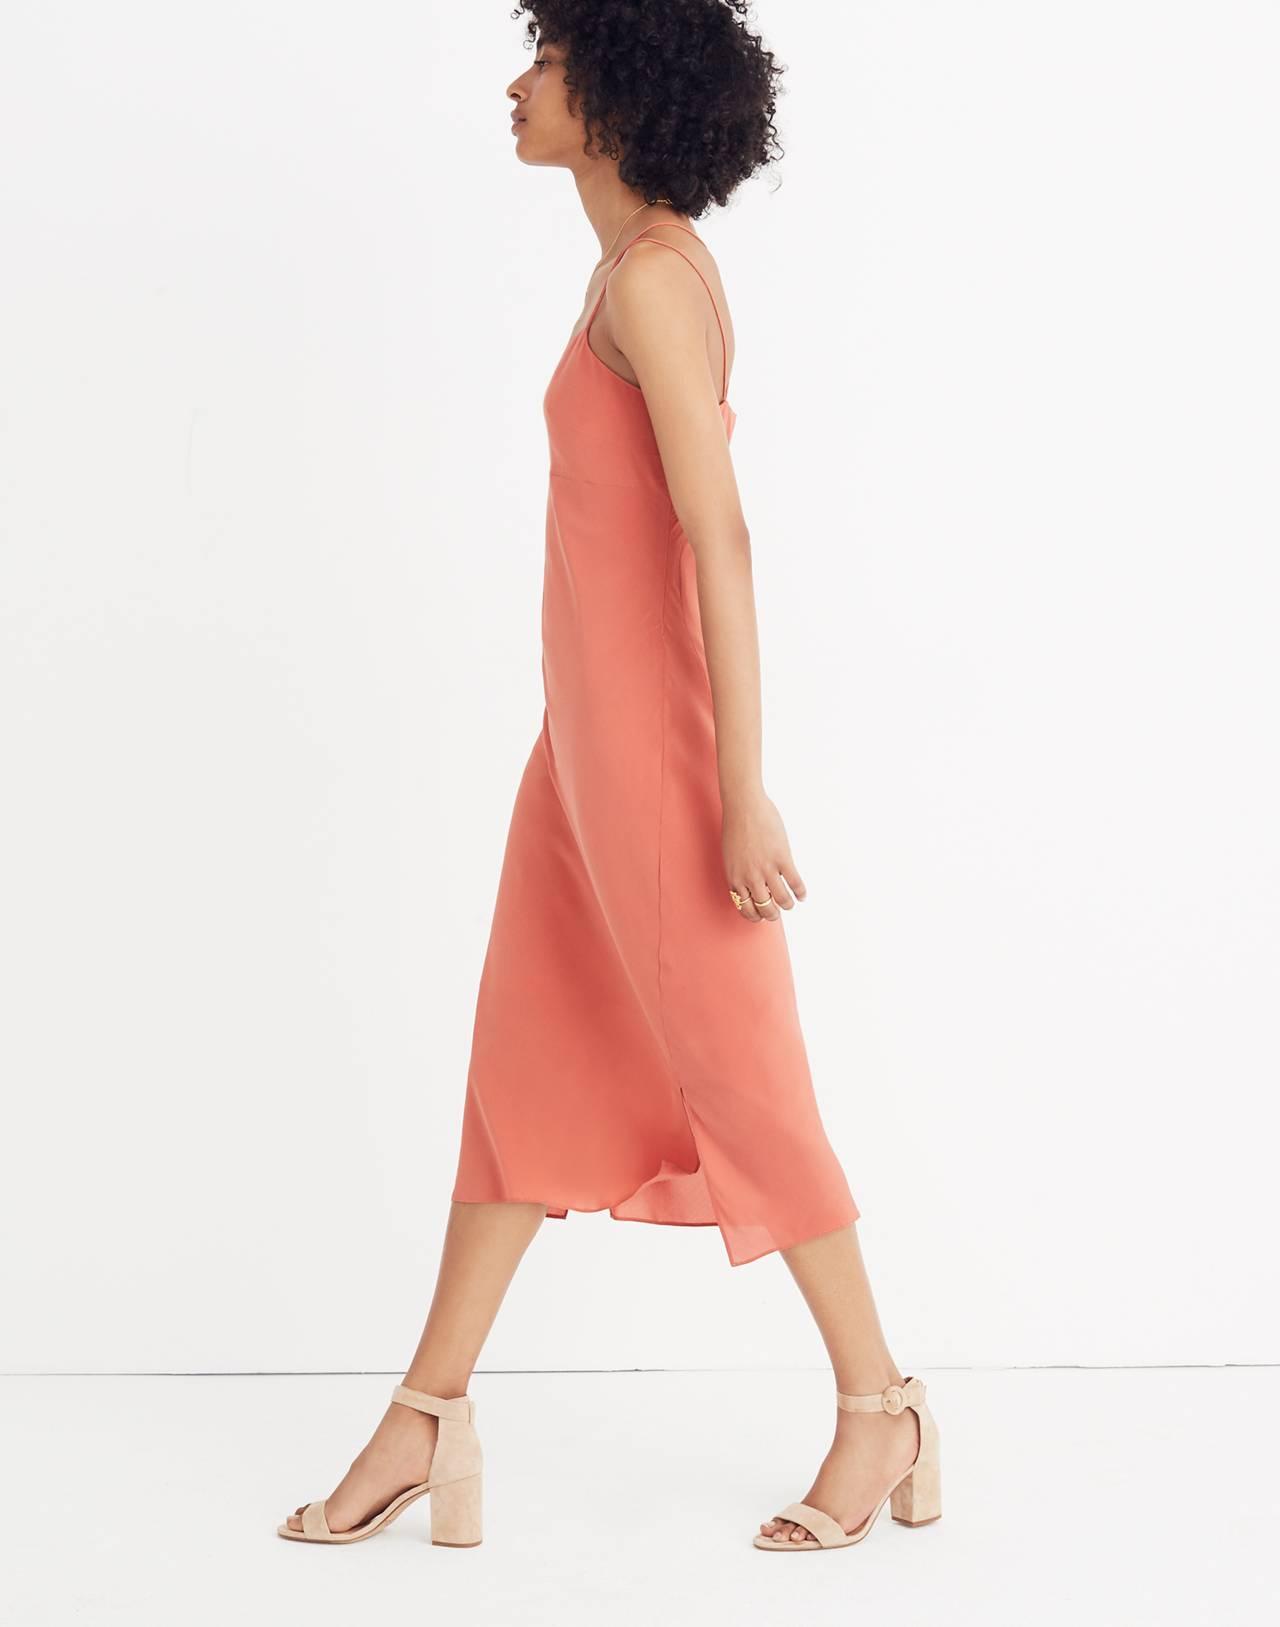 Silk Slip Dress in spiced rose image 3